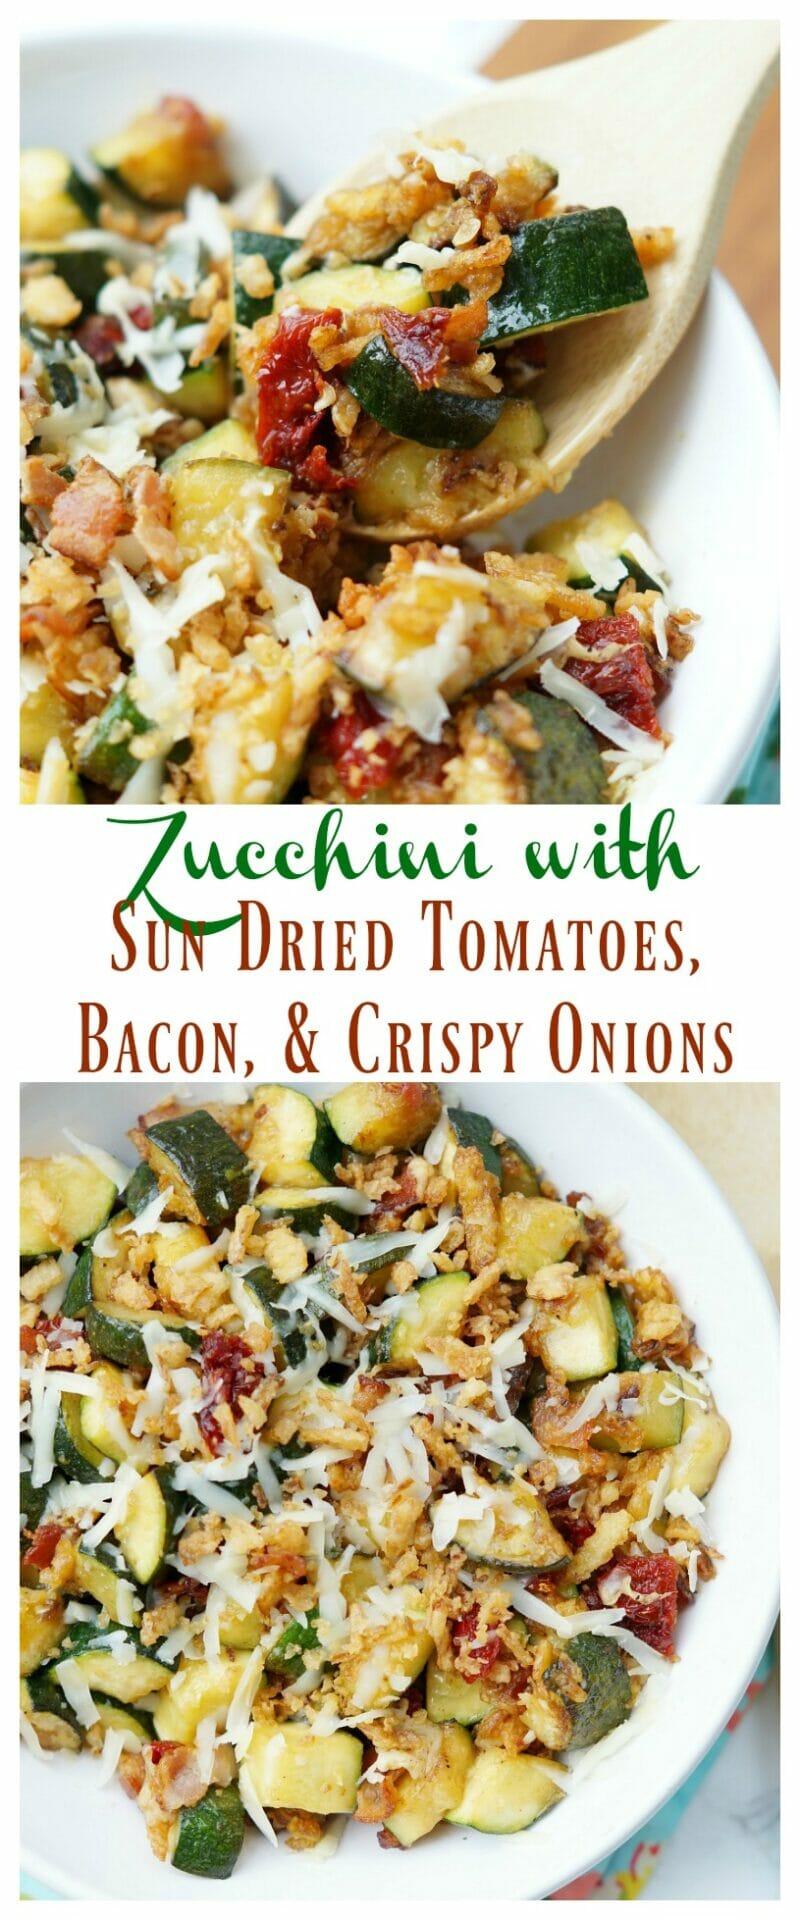 Zucchini with Sun Dried Tomato, Bacon, and Crispy Onions